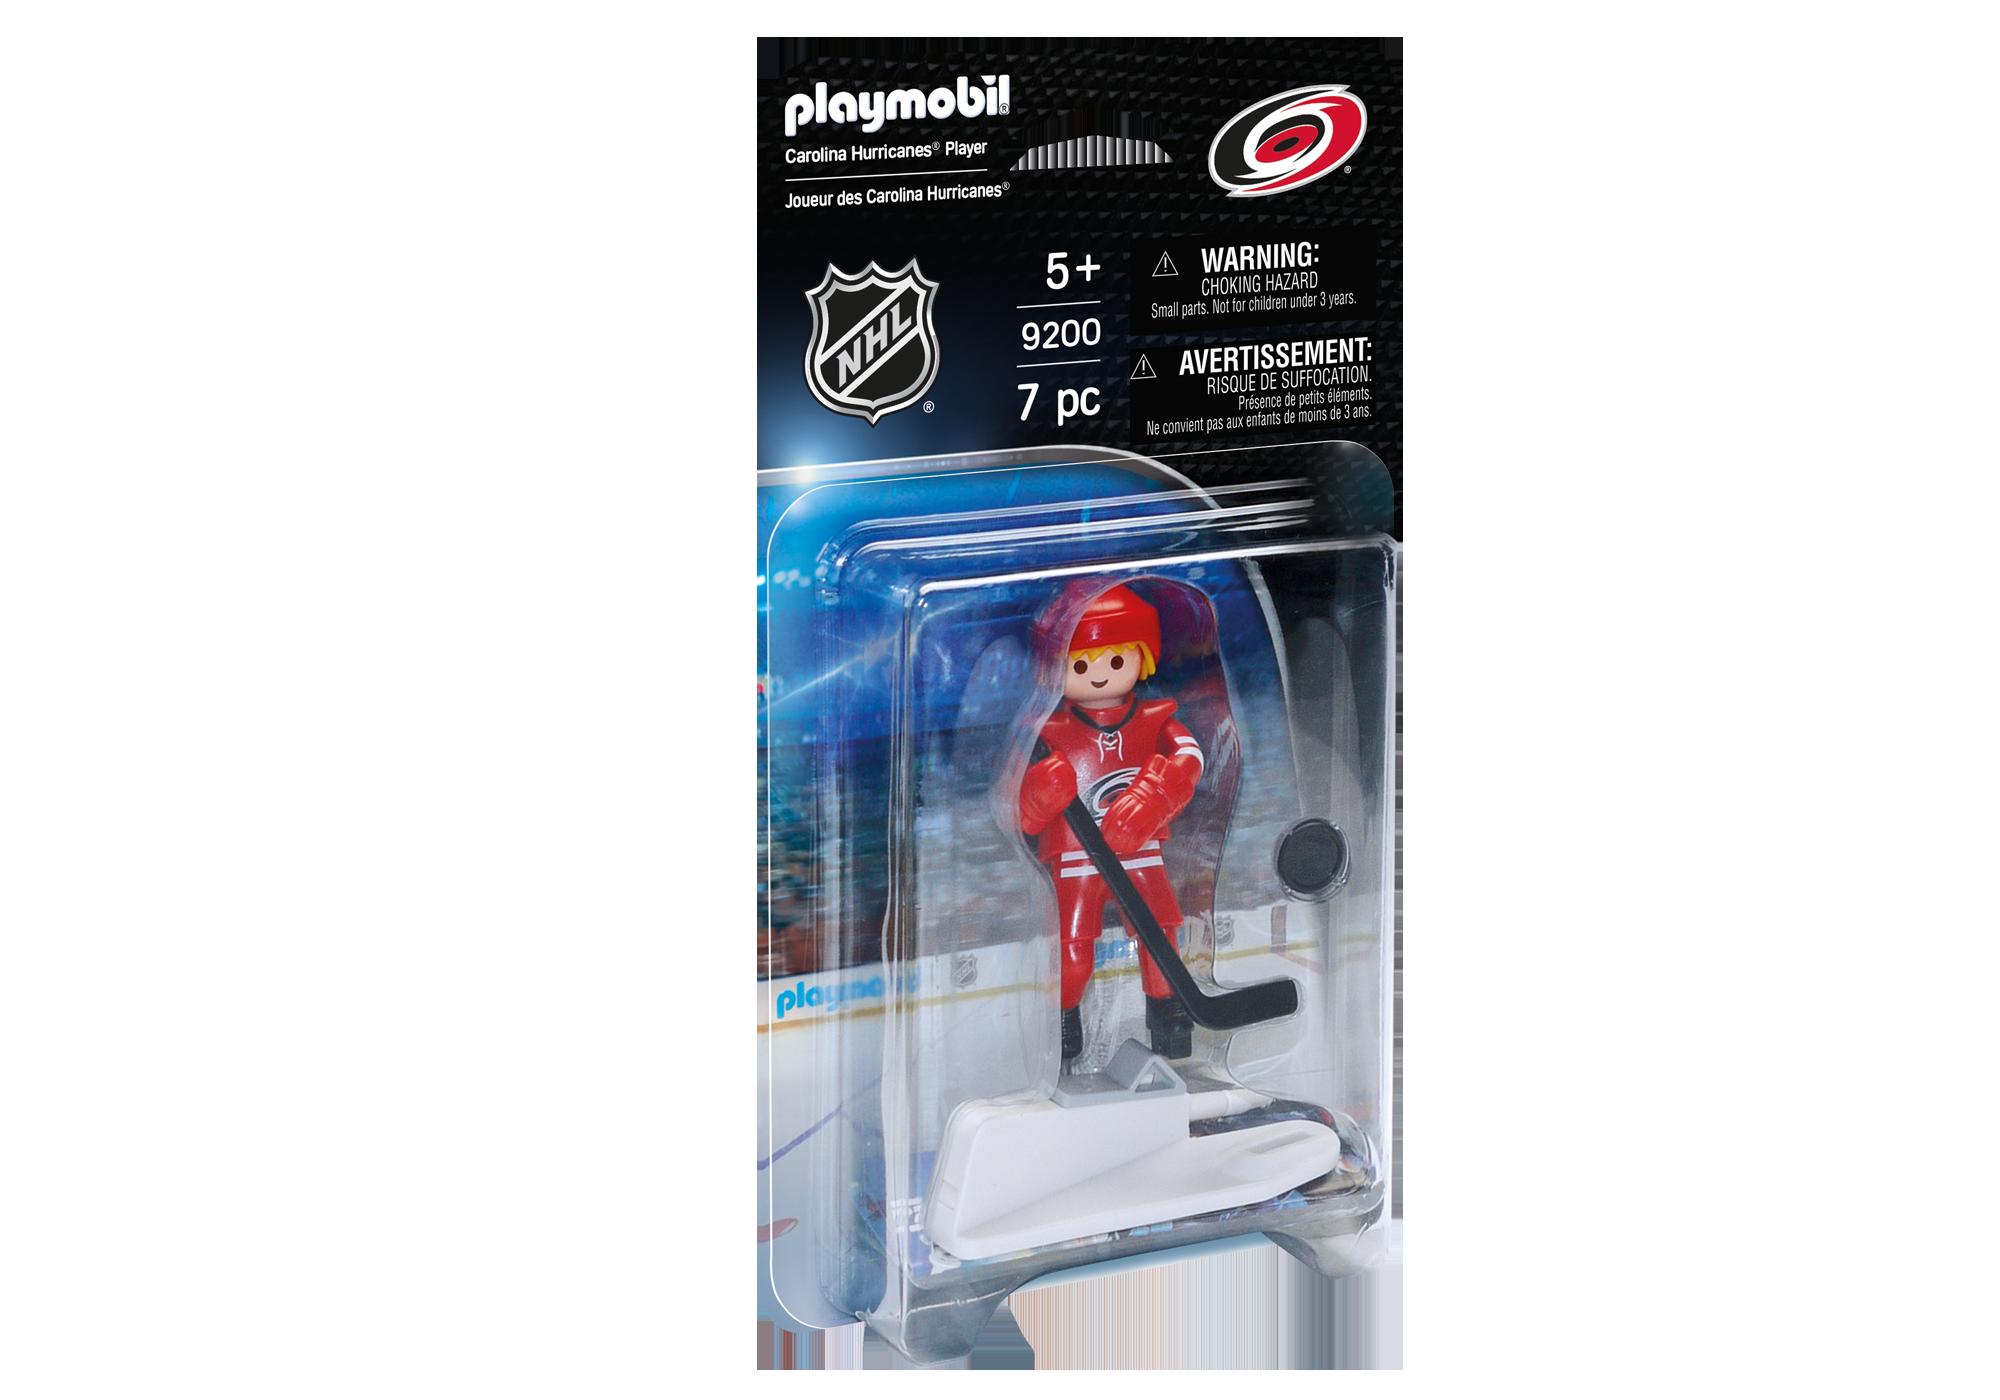 http://media.playmobil.com/i/playmobil/9200_product_box_front/NHL™ Carolina Hurricanes™ Player